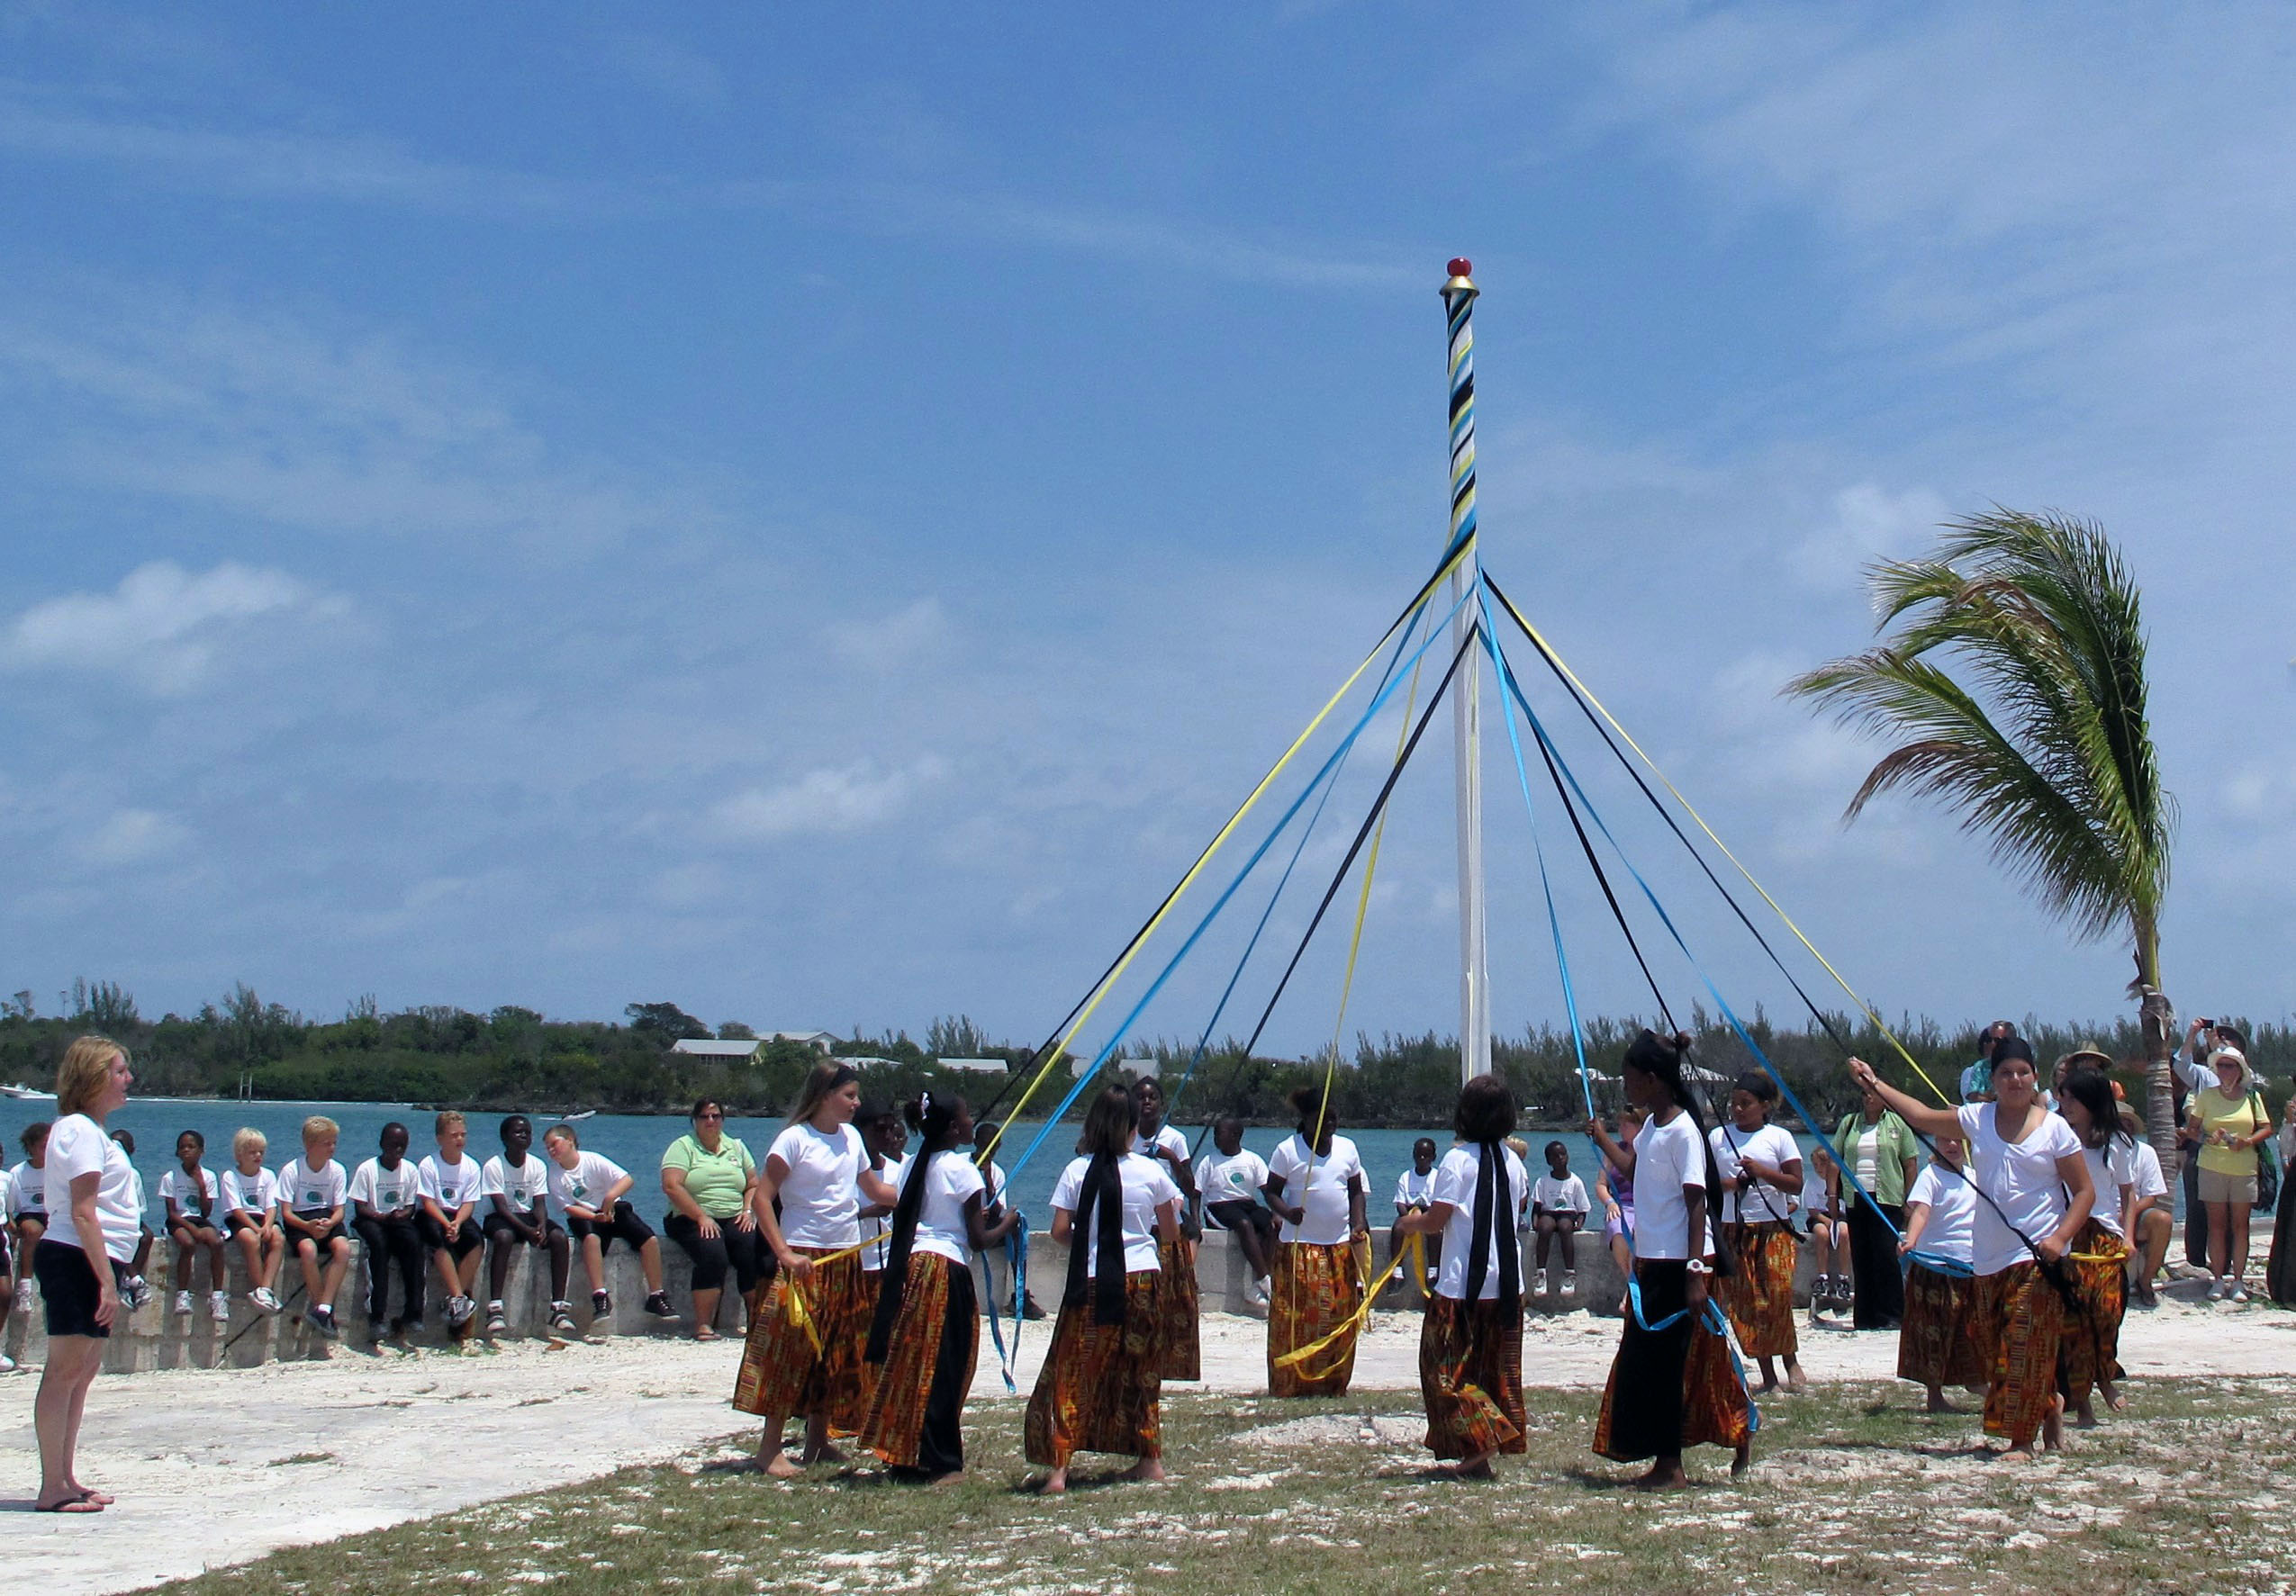 Plaiting the Maypole - IRHF 2011